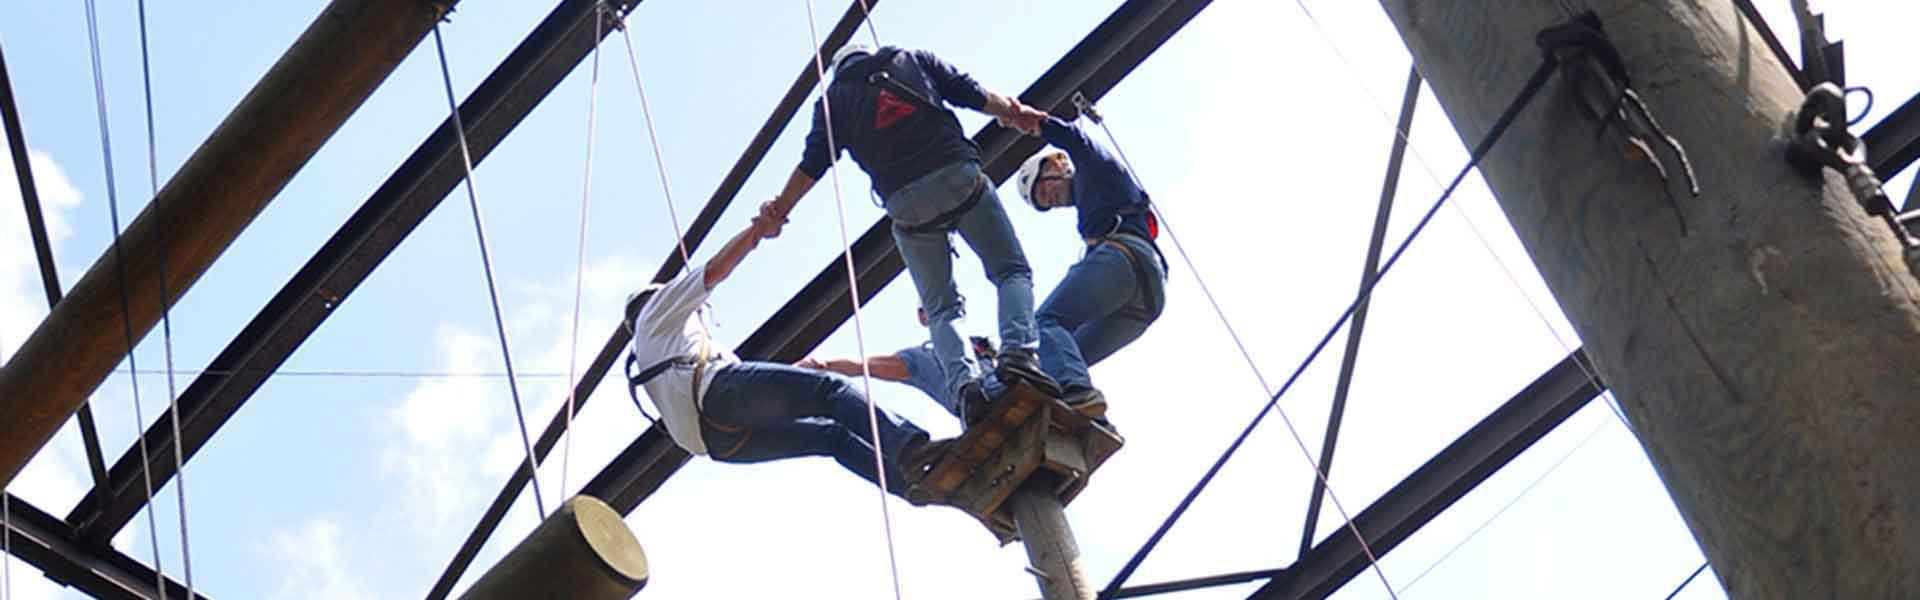 High Ropes Course | Bedrijfsuitjes in Twente